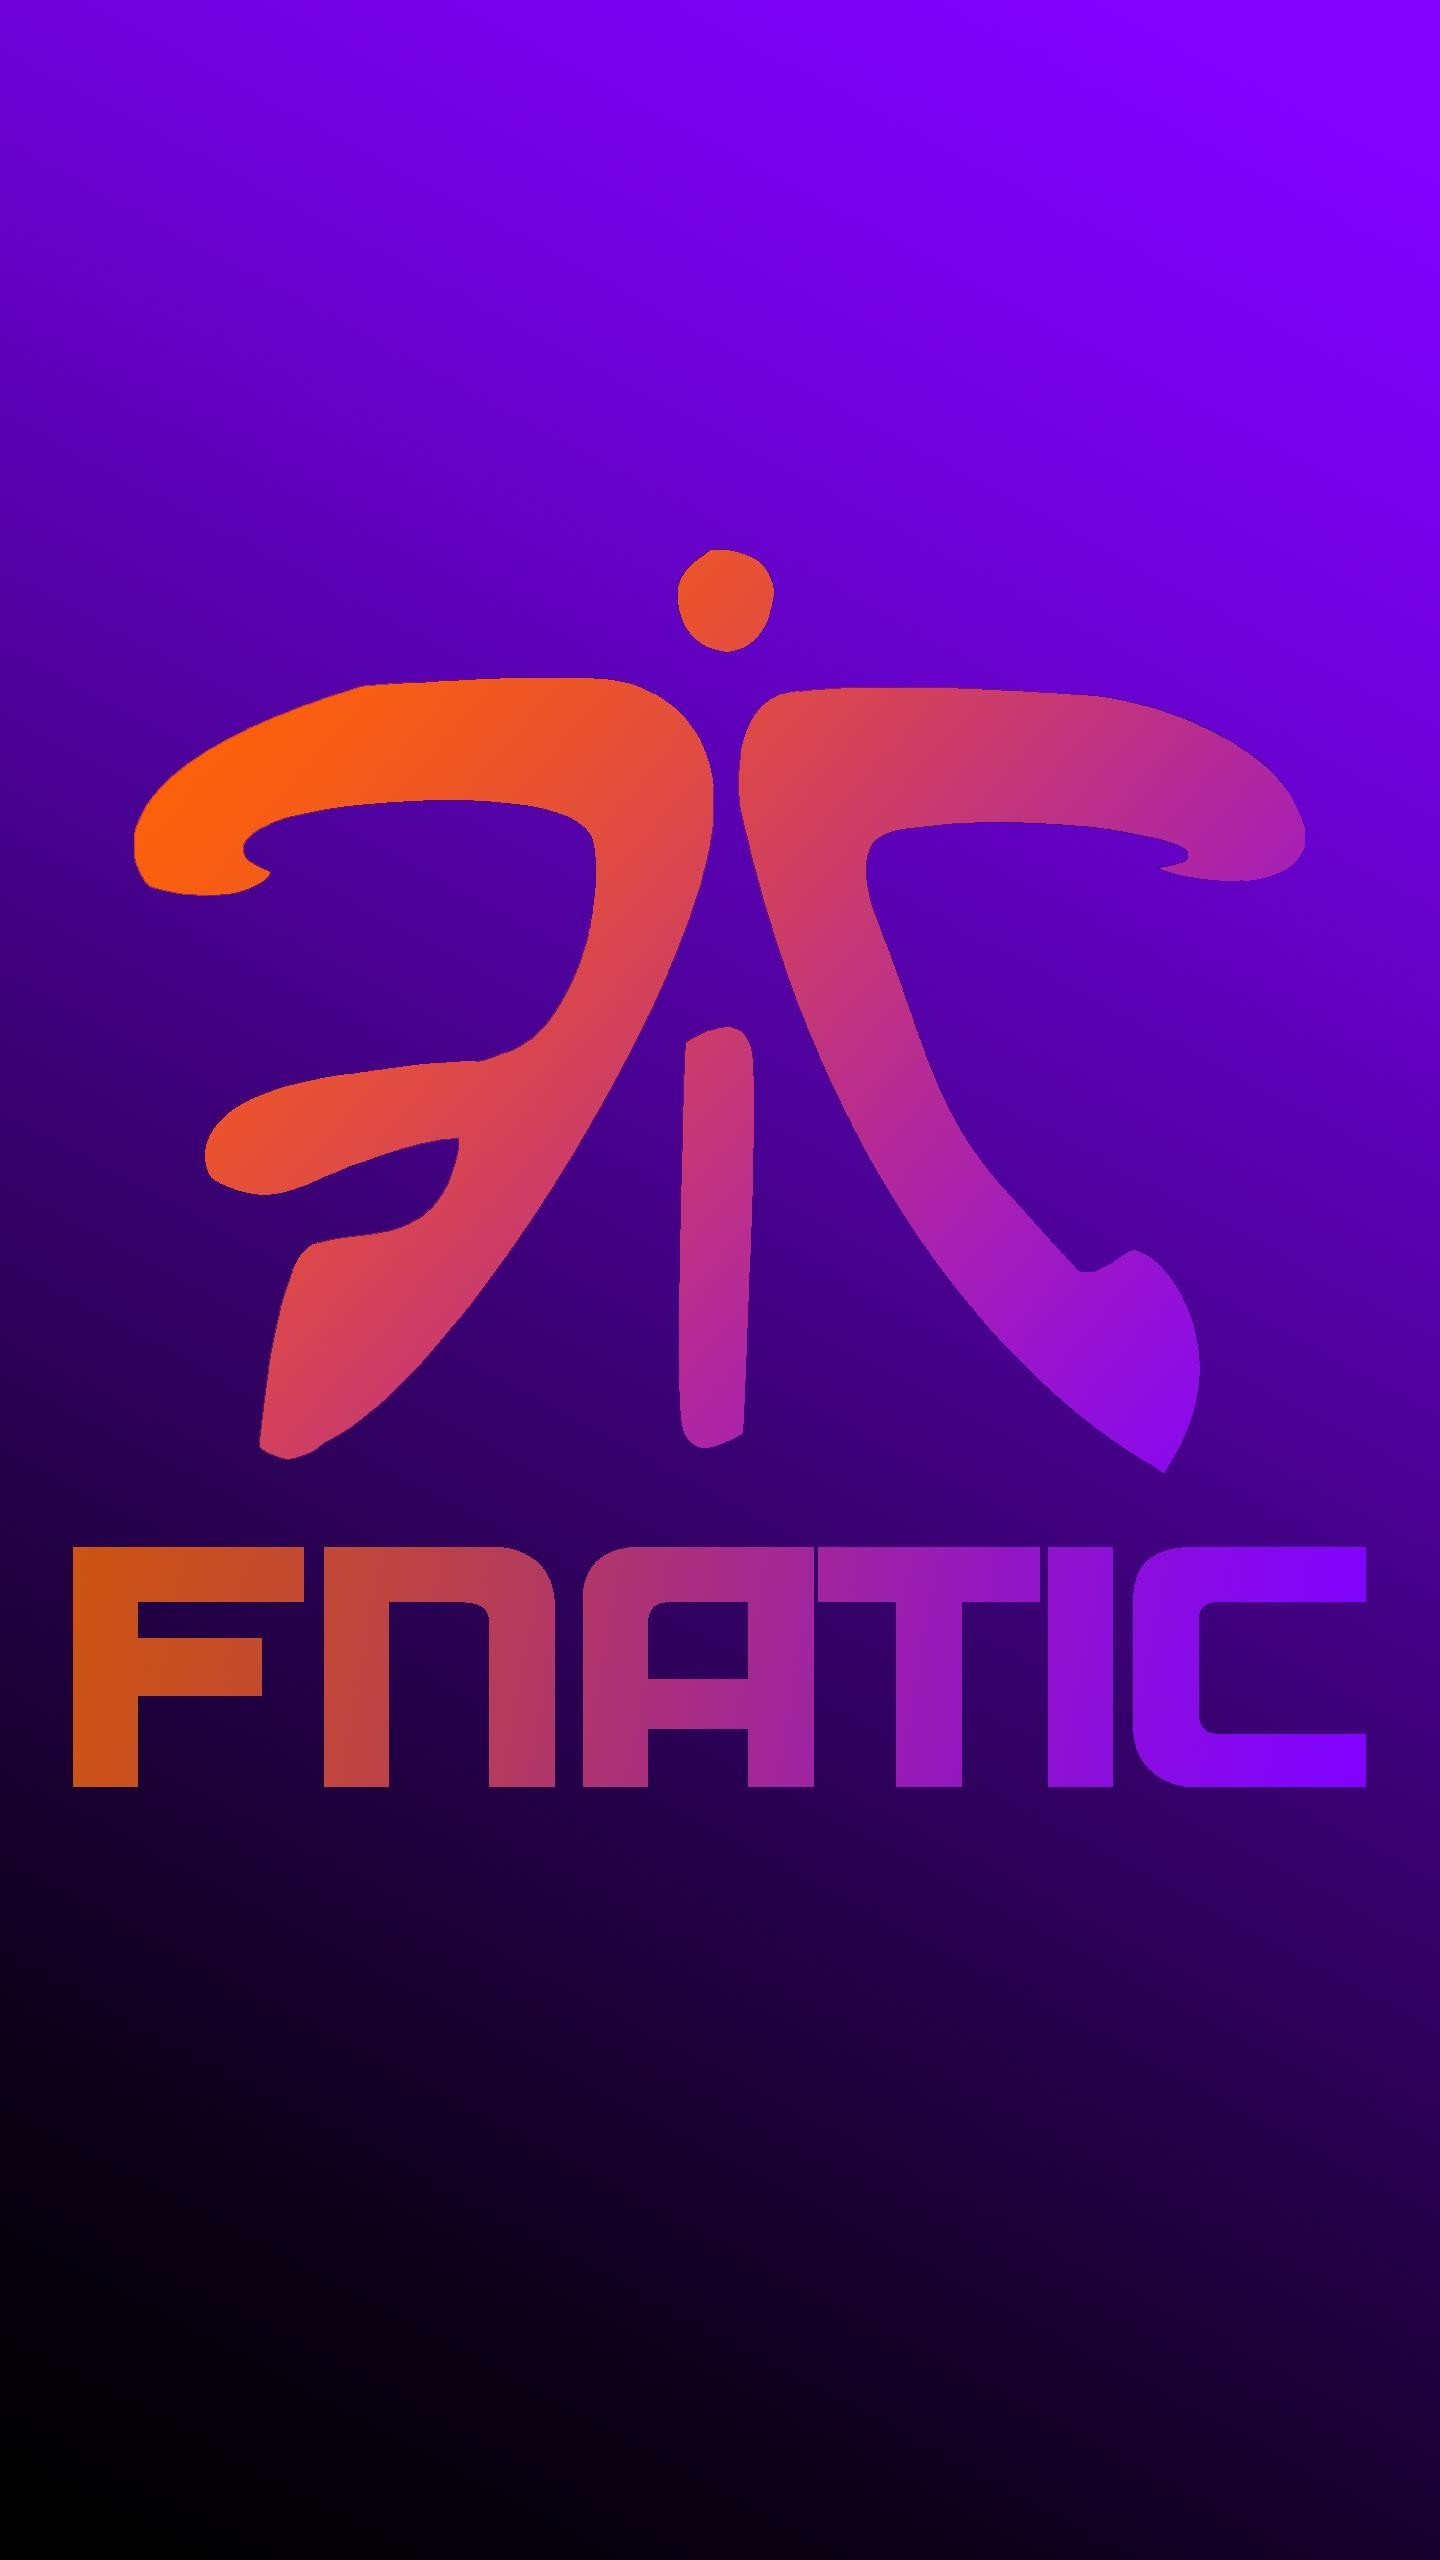 UGCI made a mobile wallpaper for Fnatic fans!